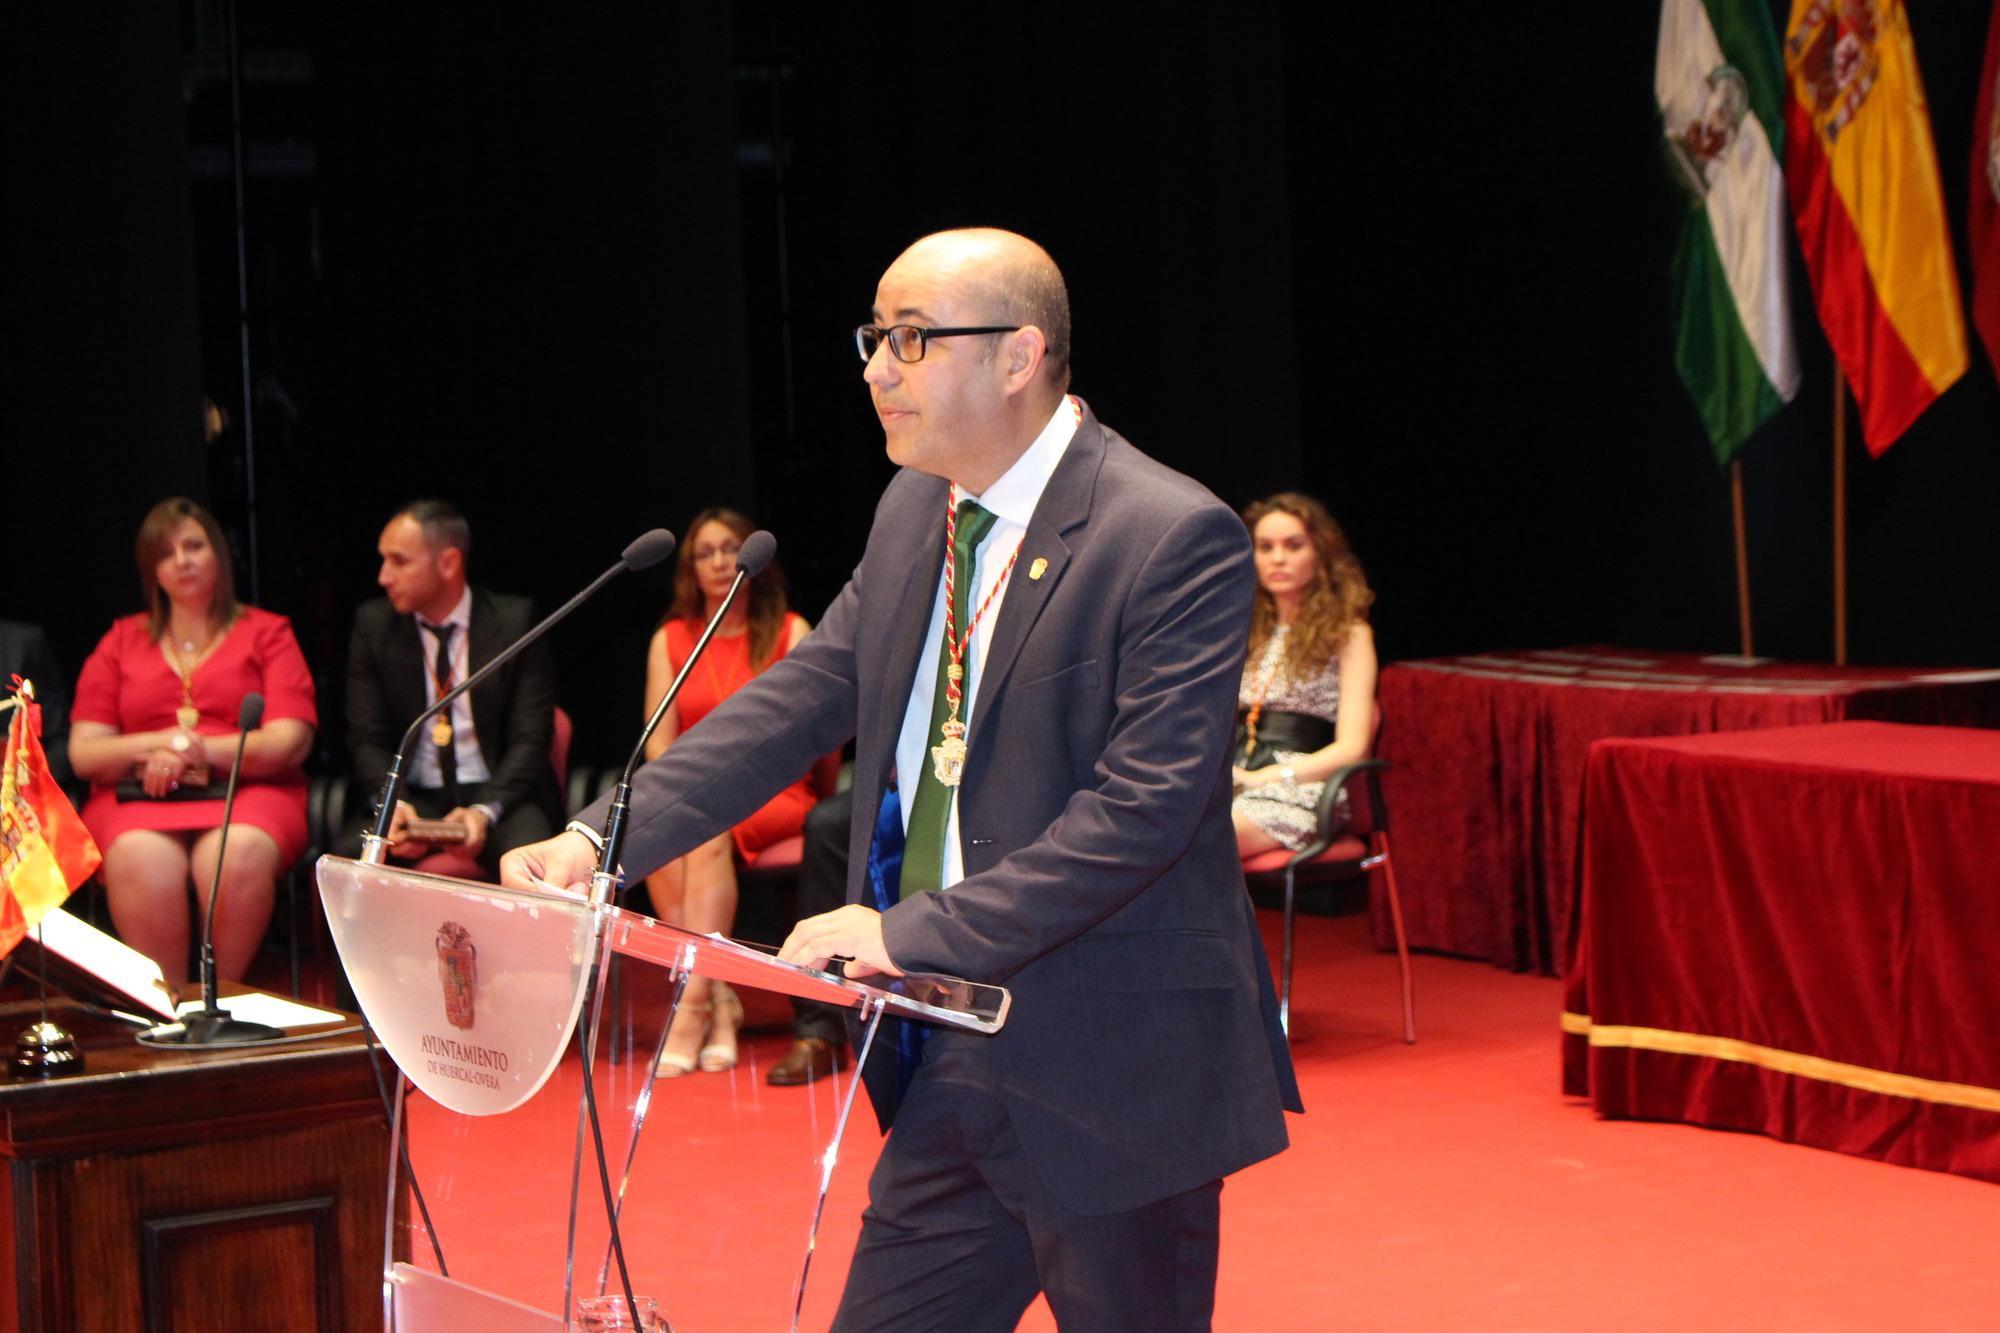 Domingo Fernández afronta un segundo mandato como alcalde de Huércal Overa tras su investidura